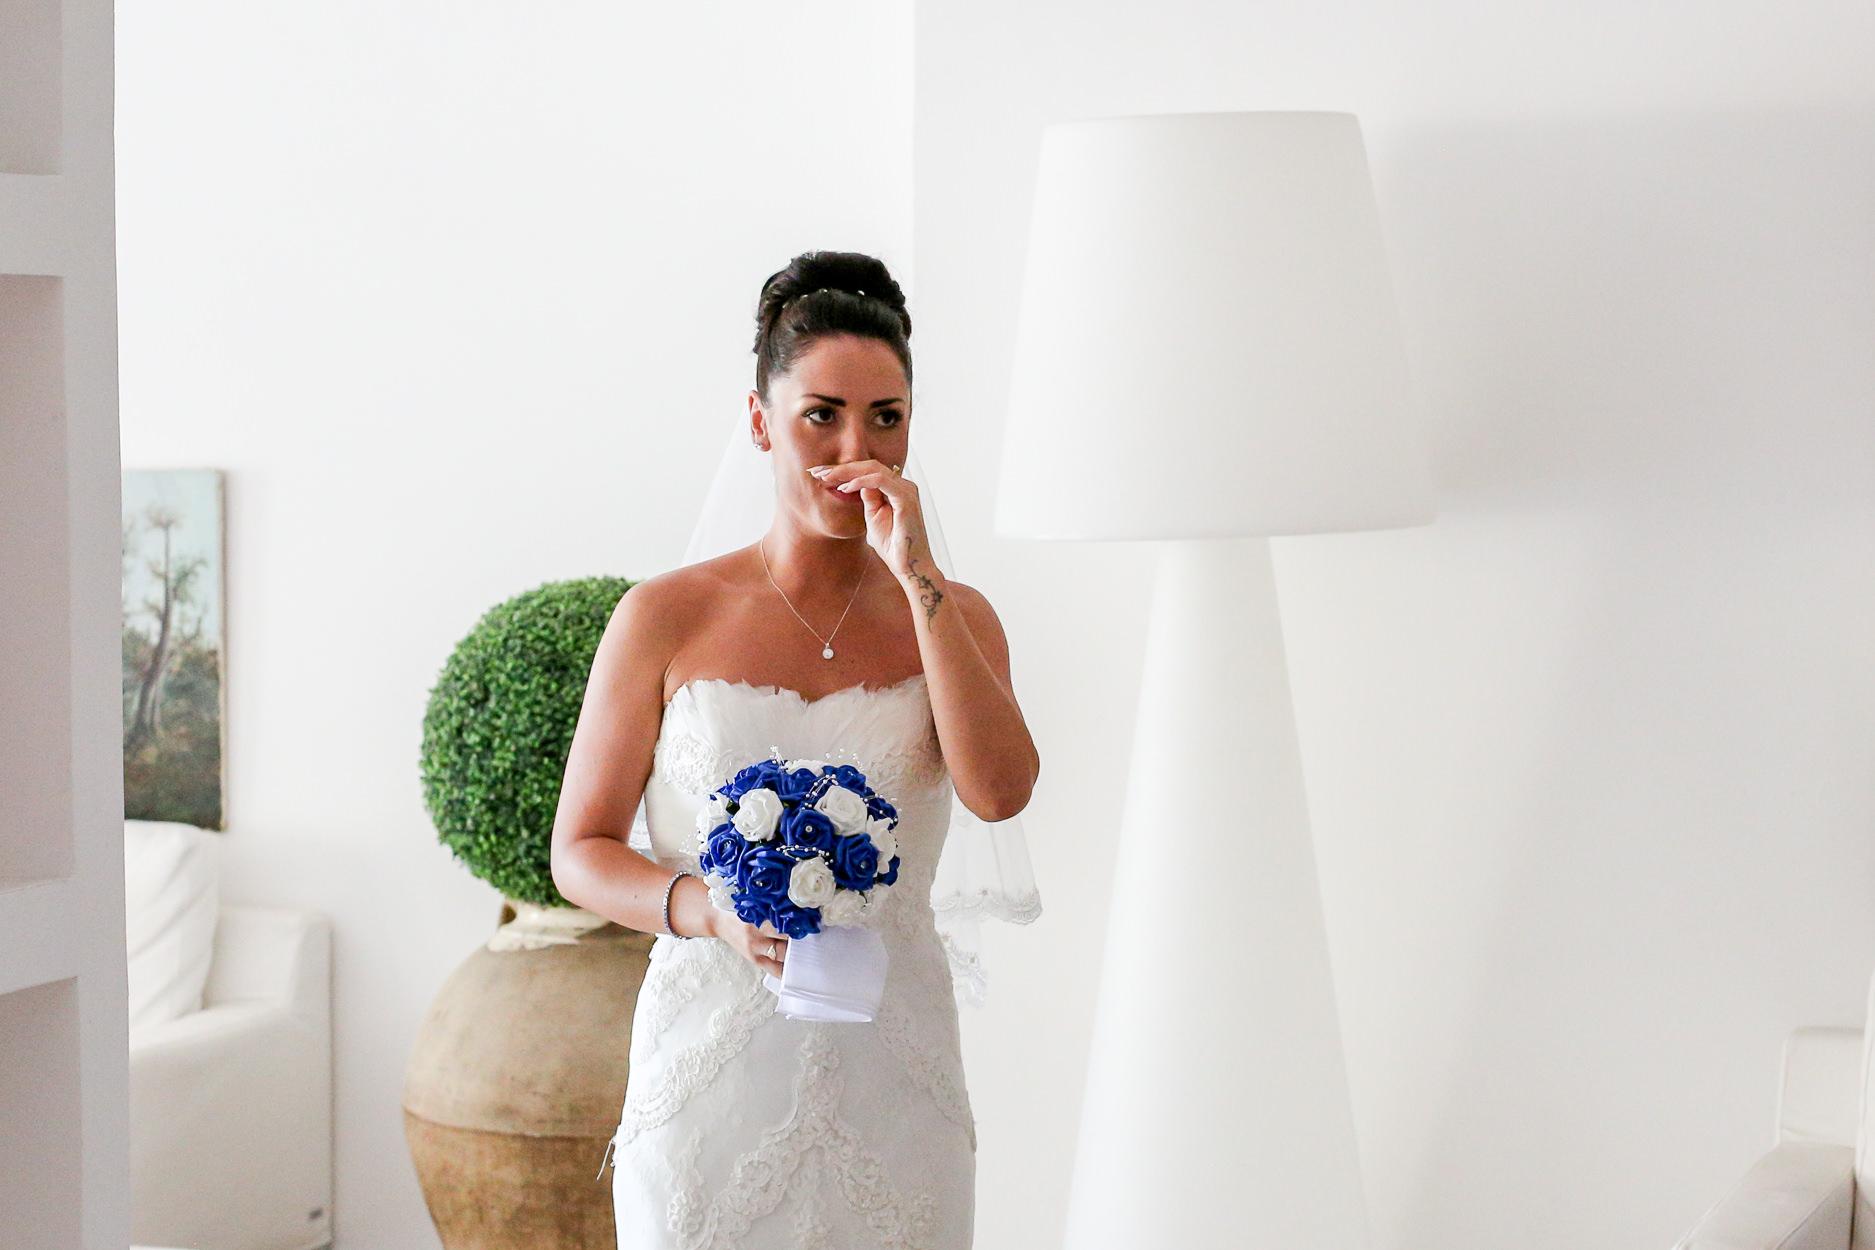 English-Wedding-Photographer-Sorrento- Rivage-Hotel-Pridal-Preparations-Pronovias-Wedding-Dress-20